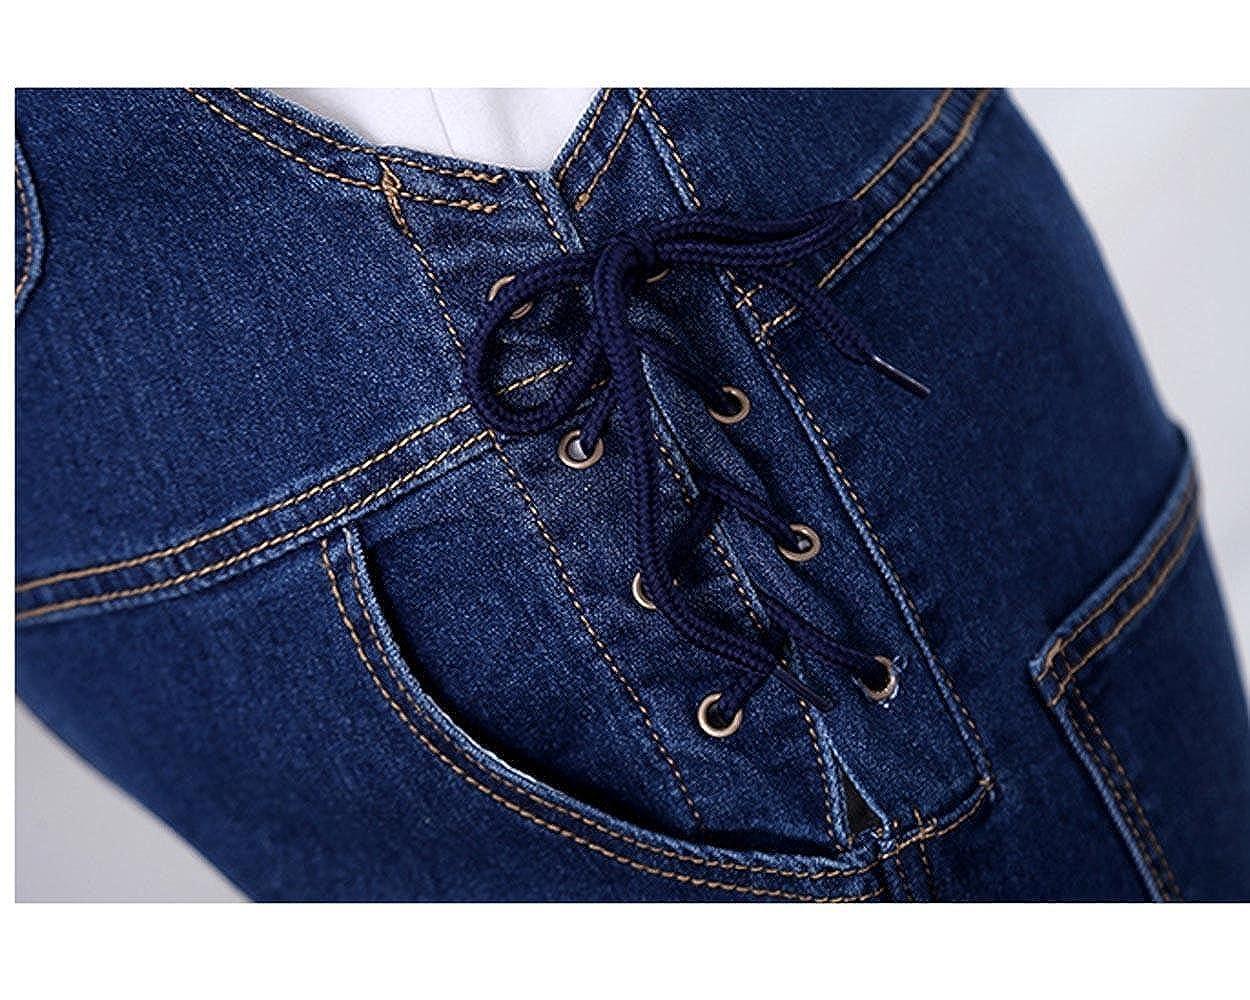 0c02465201e8 Amazon.com  Tech BS Adjustable Denim Maternity Overalls Protect The Waist   Clothing